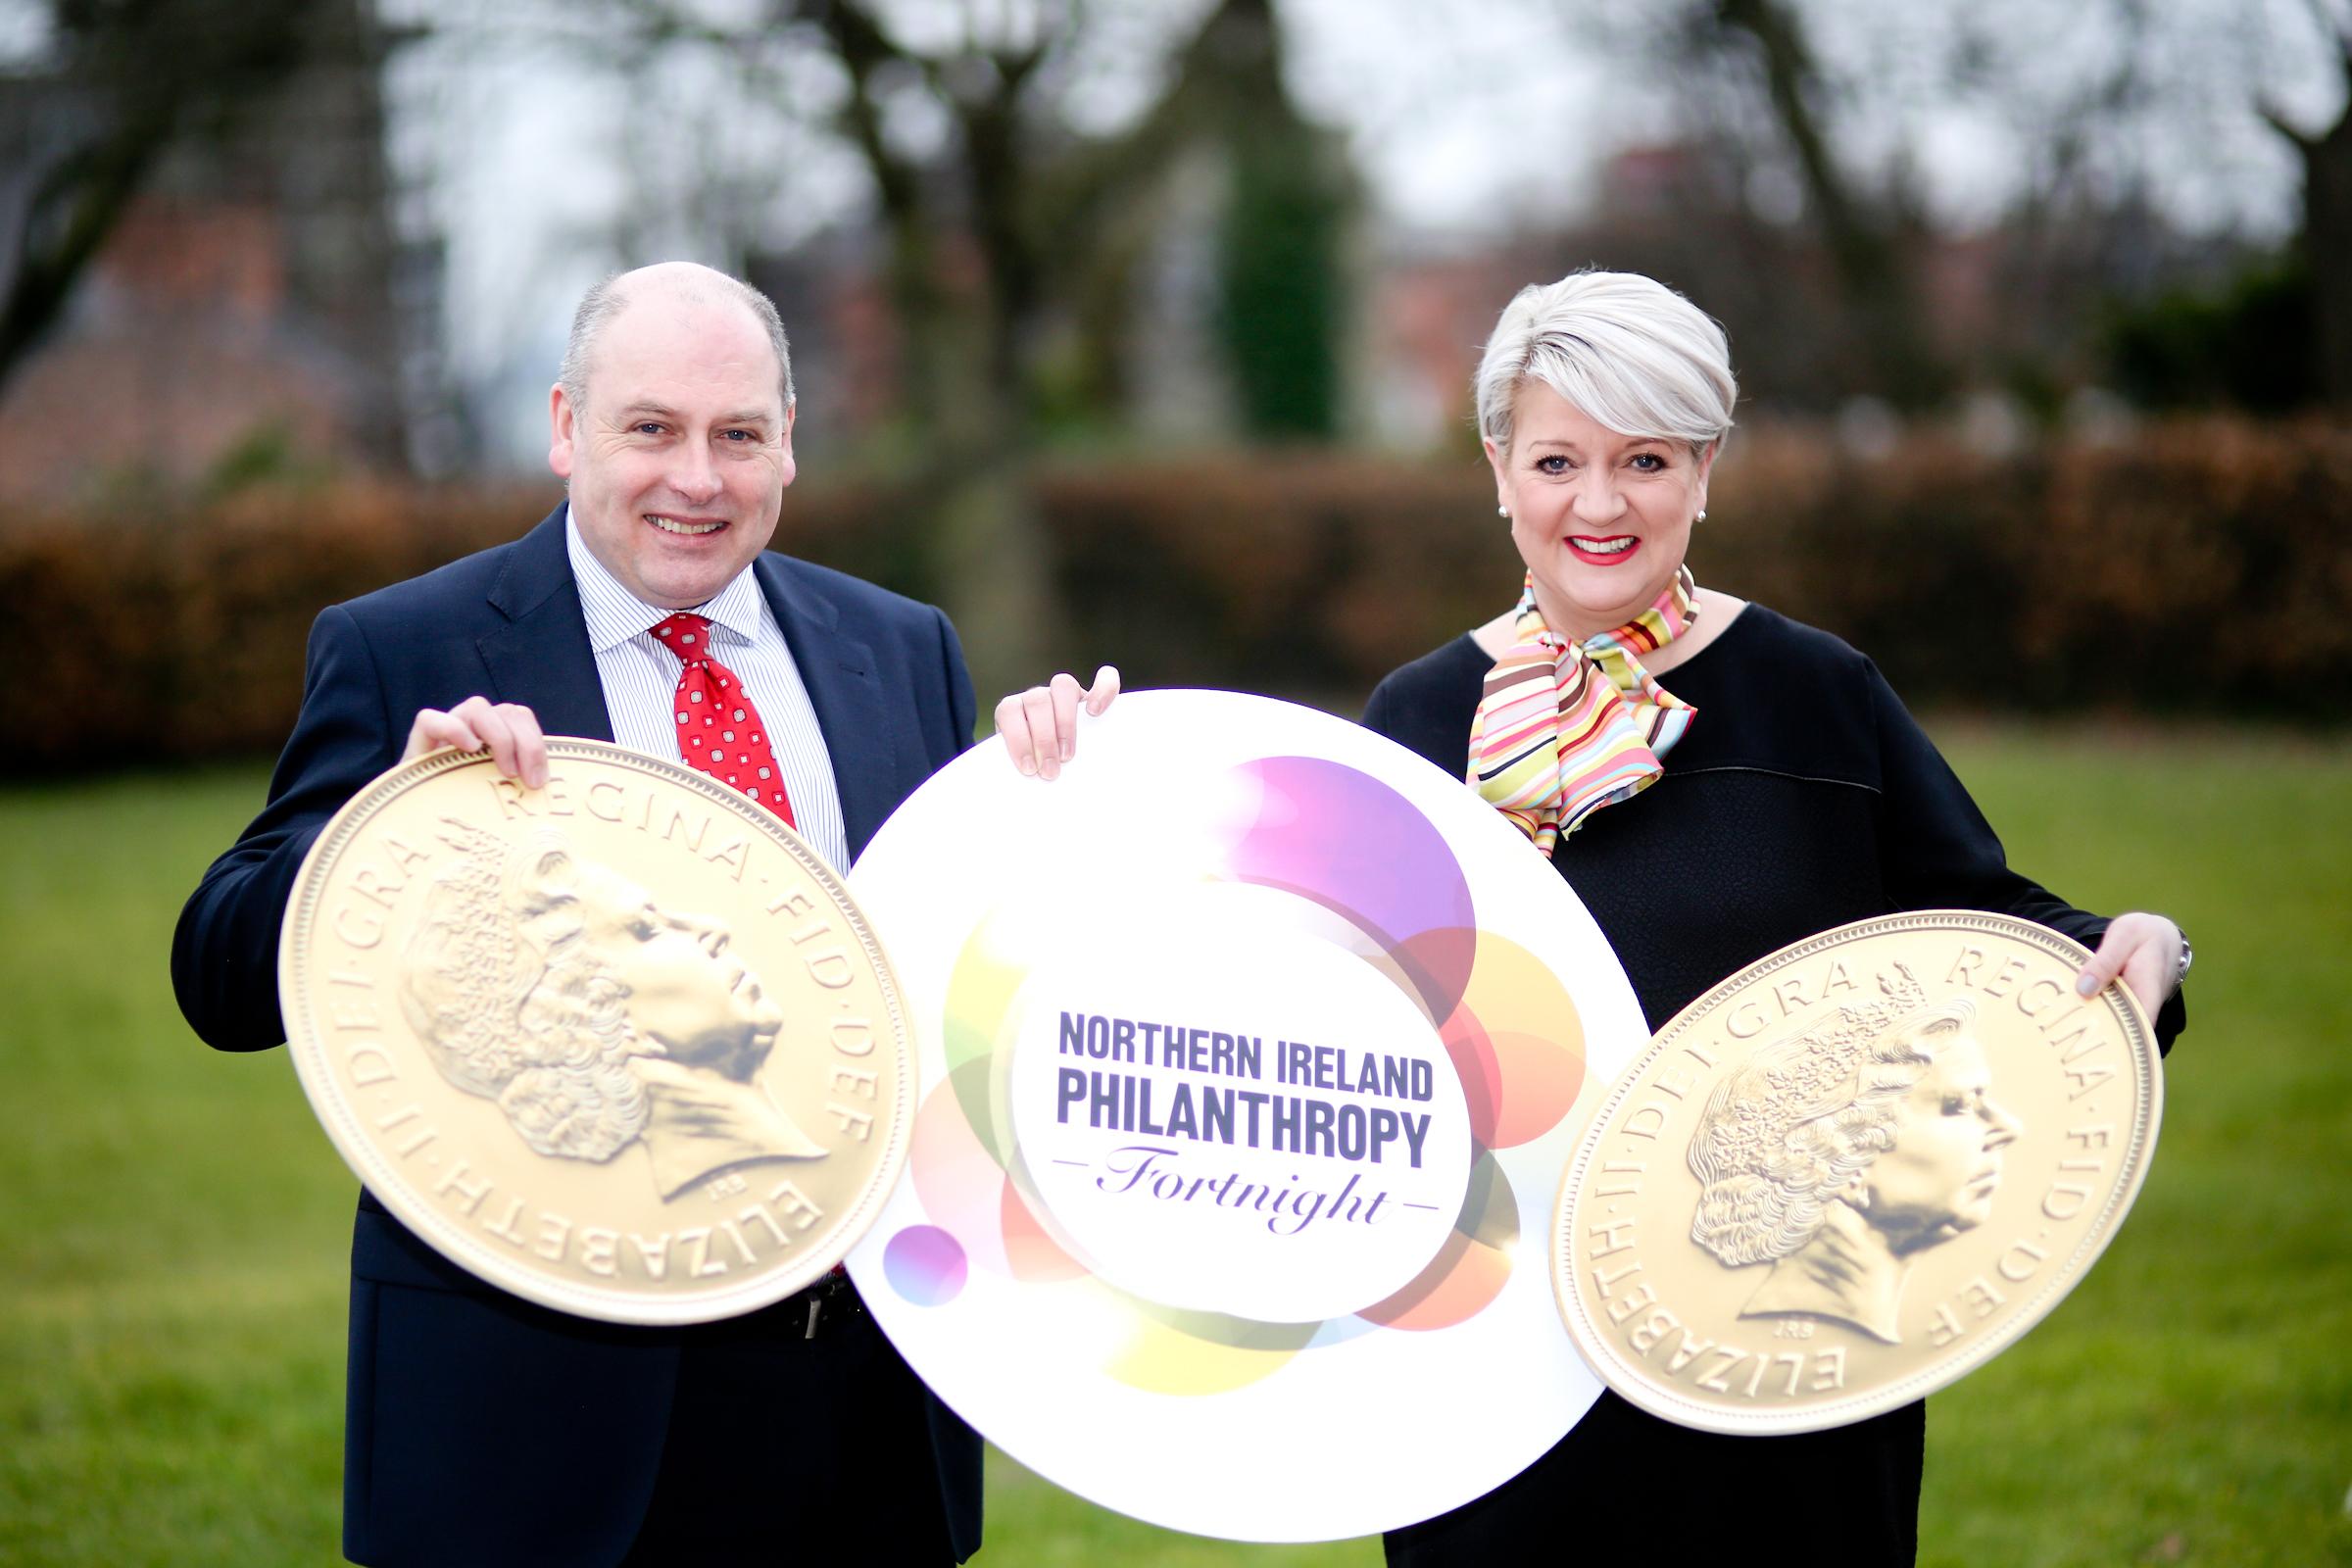 Philanthropy Fortnight – a celebration of Northern Ireland's generosity